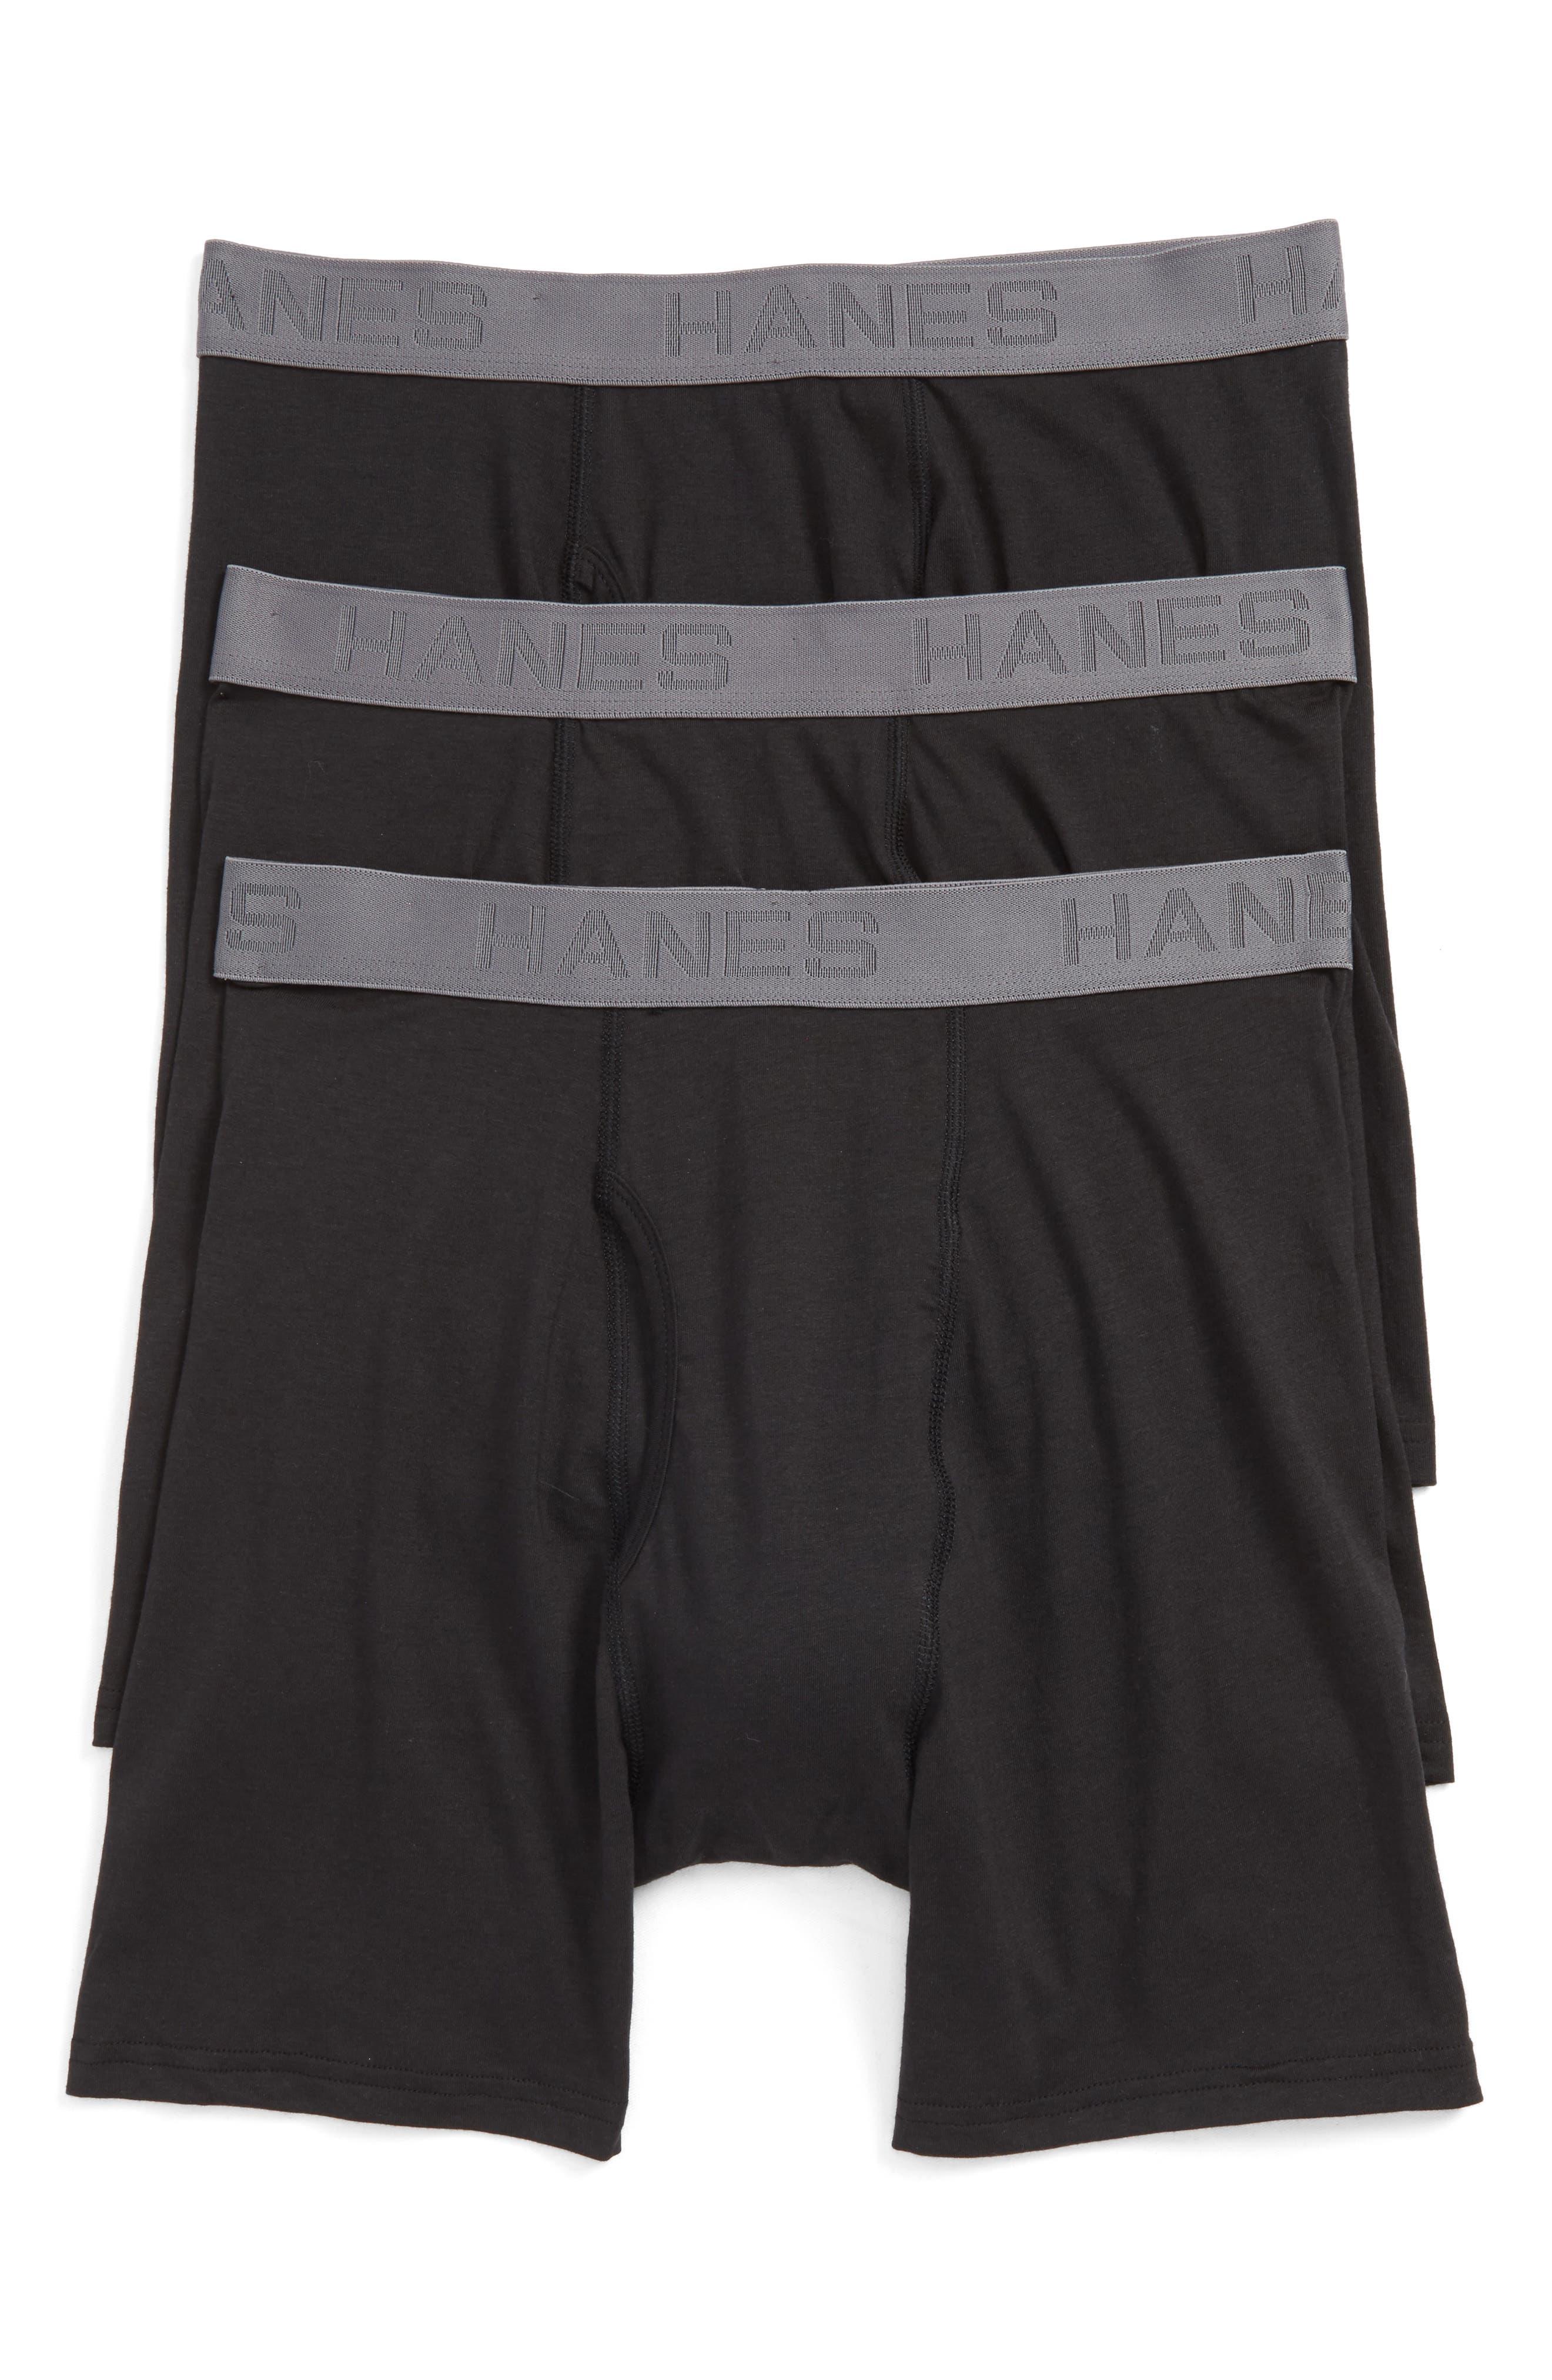 Main Image - Hanes Luxury Essentials 3-Pack Boxer Briefs